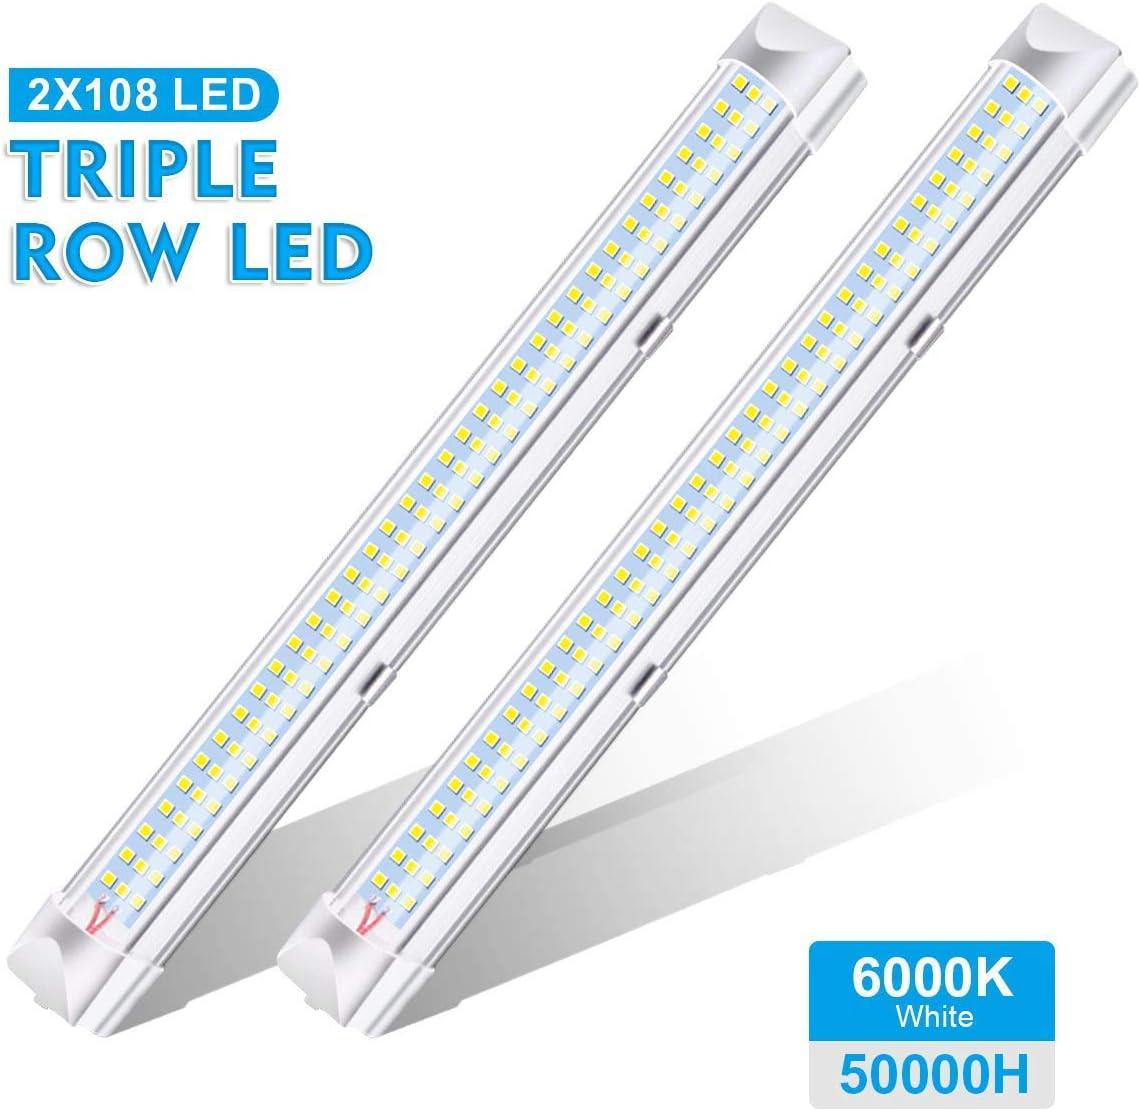 Wei/ß 3er Pack AMBOTHER 3x 72 LED Innenbeleuchtung LED Innenraumbeleuchtung 12V LED Lichtleiste Unterbauleuchte Einbauleuchte LED Innenleuchte Leselampe Leuchtstofflampe f/ür Camping Schrank Regal